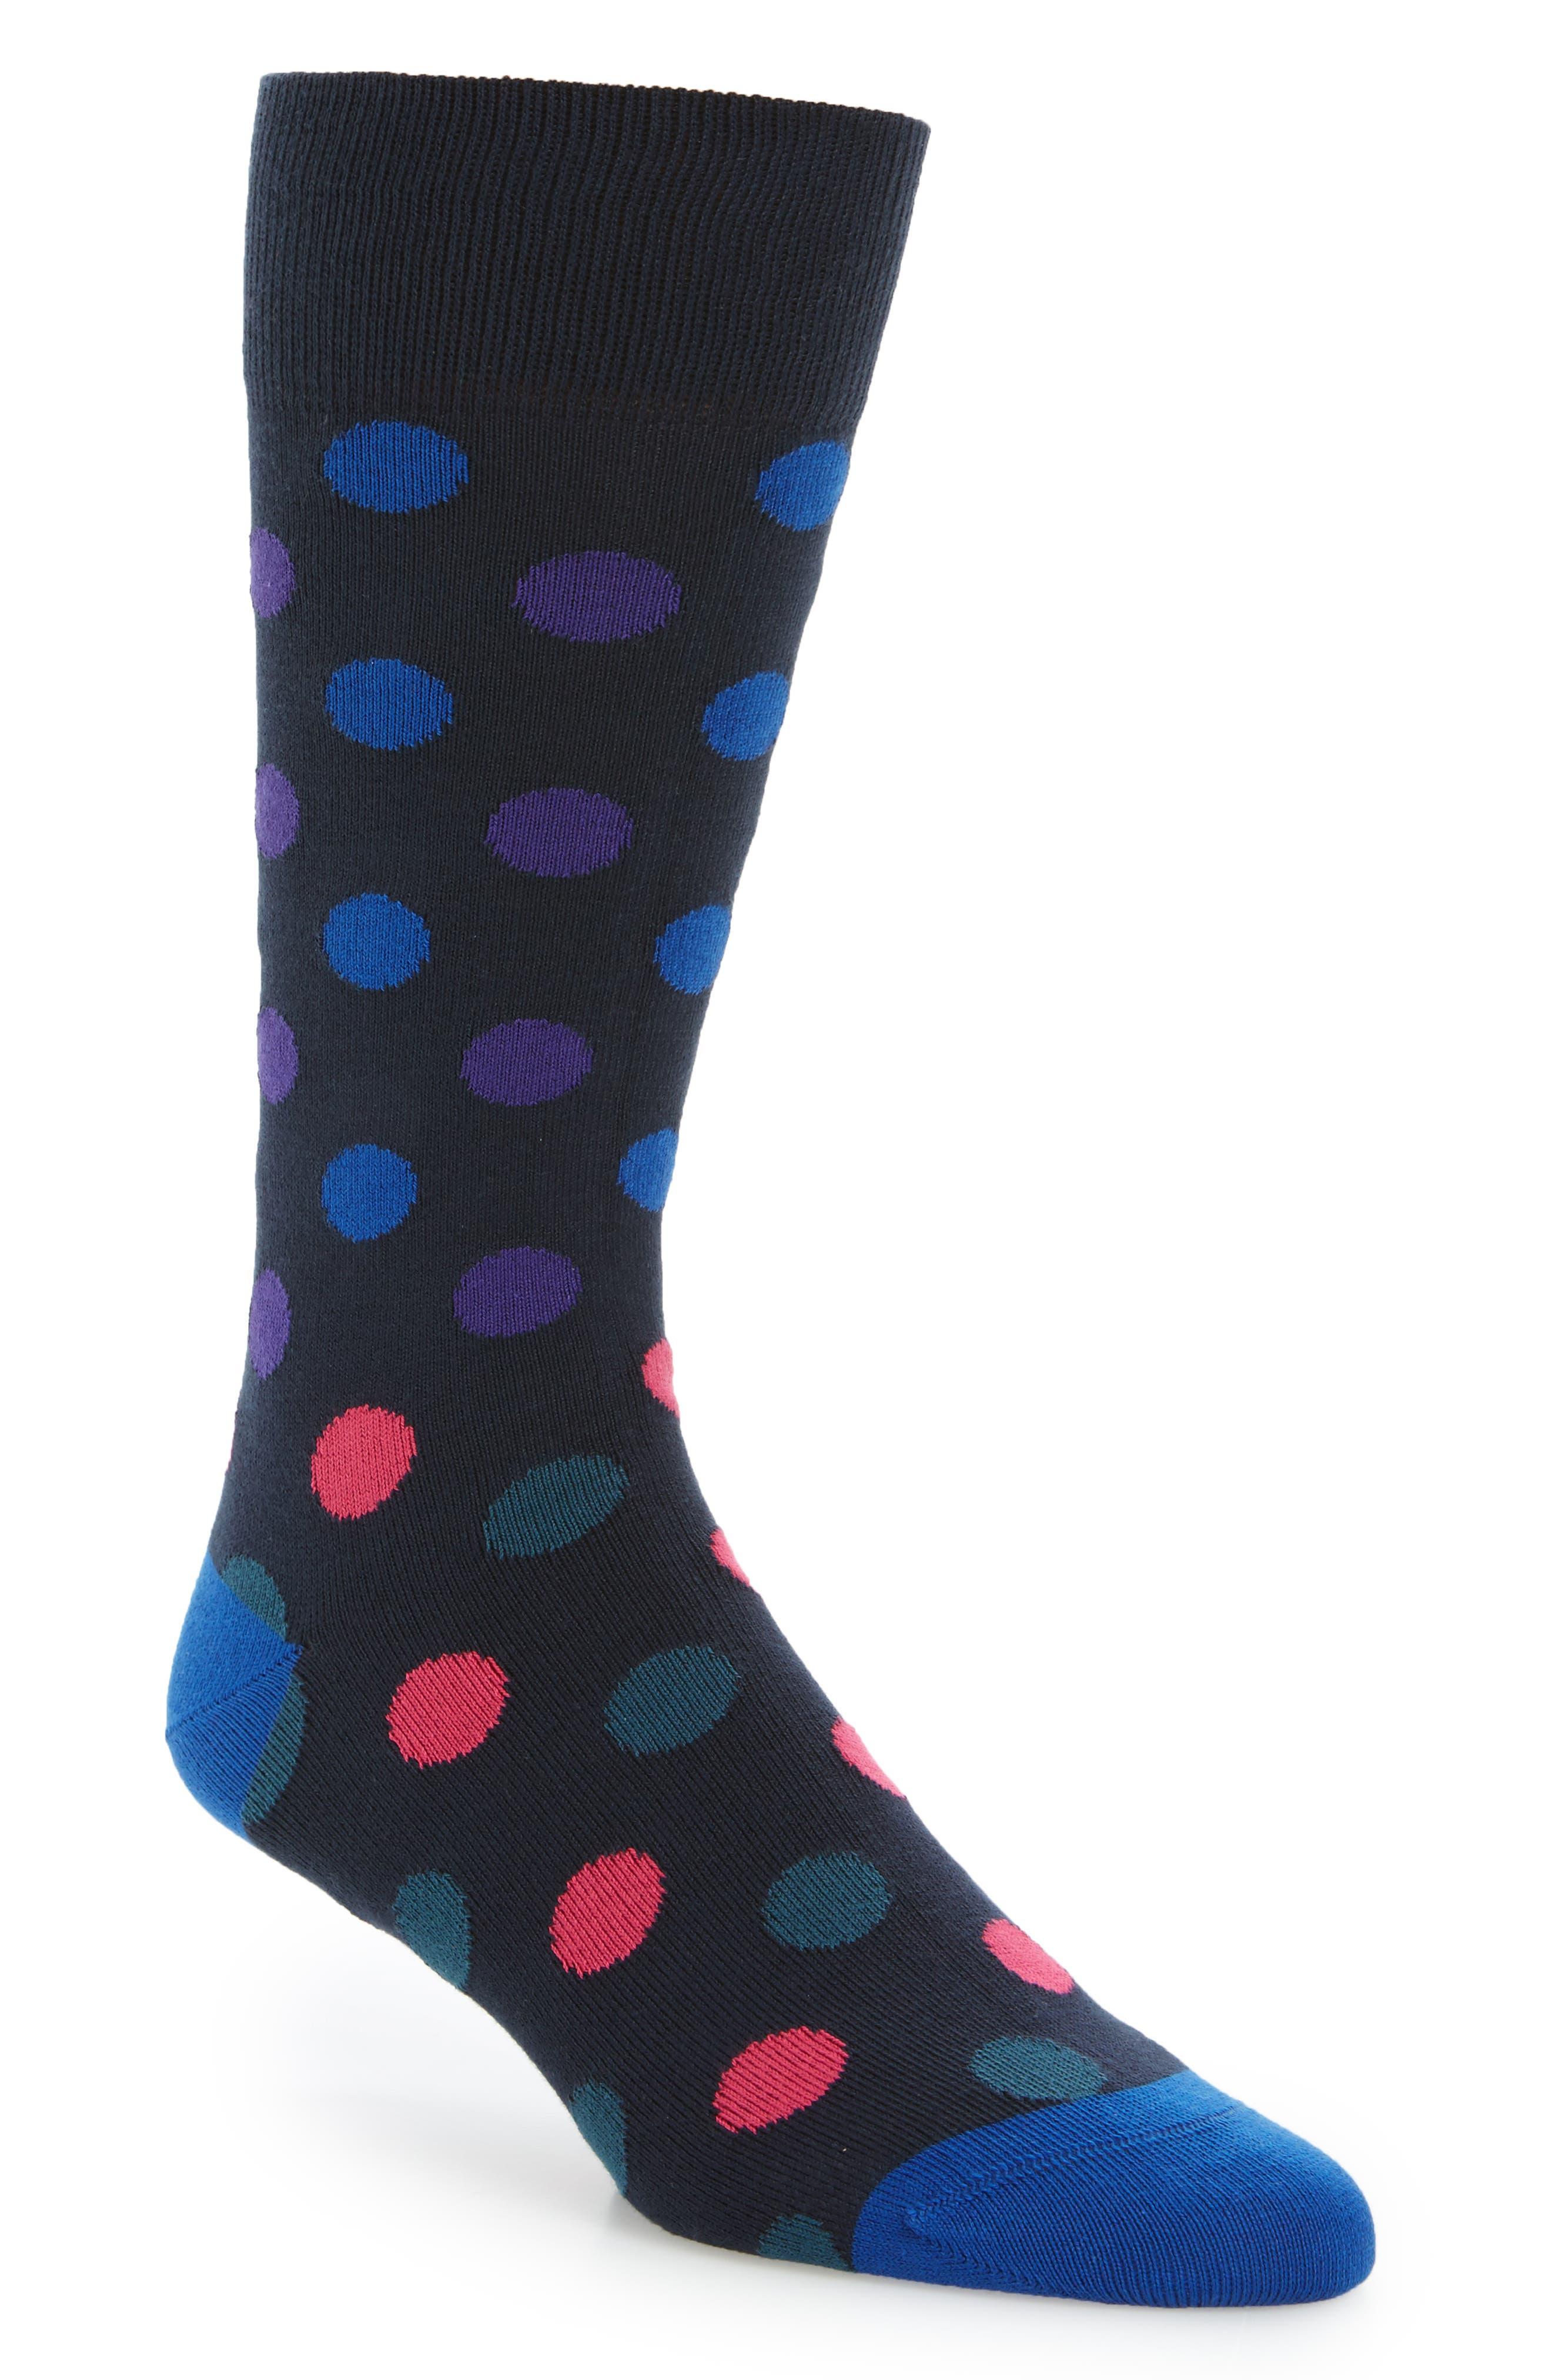 Samic Polka Dot Socks,                             Main thumbnail 1, color,                             415